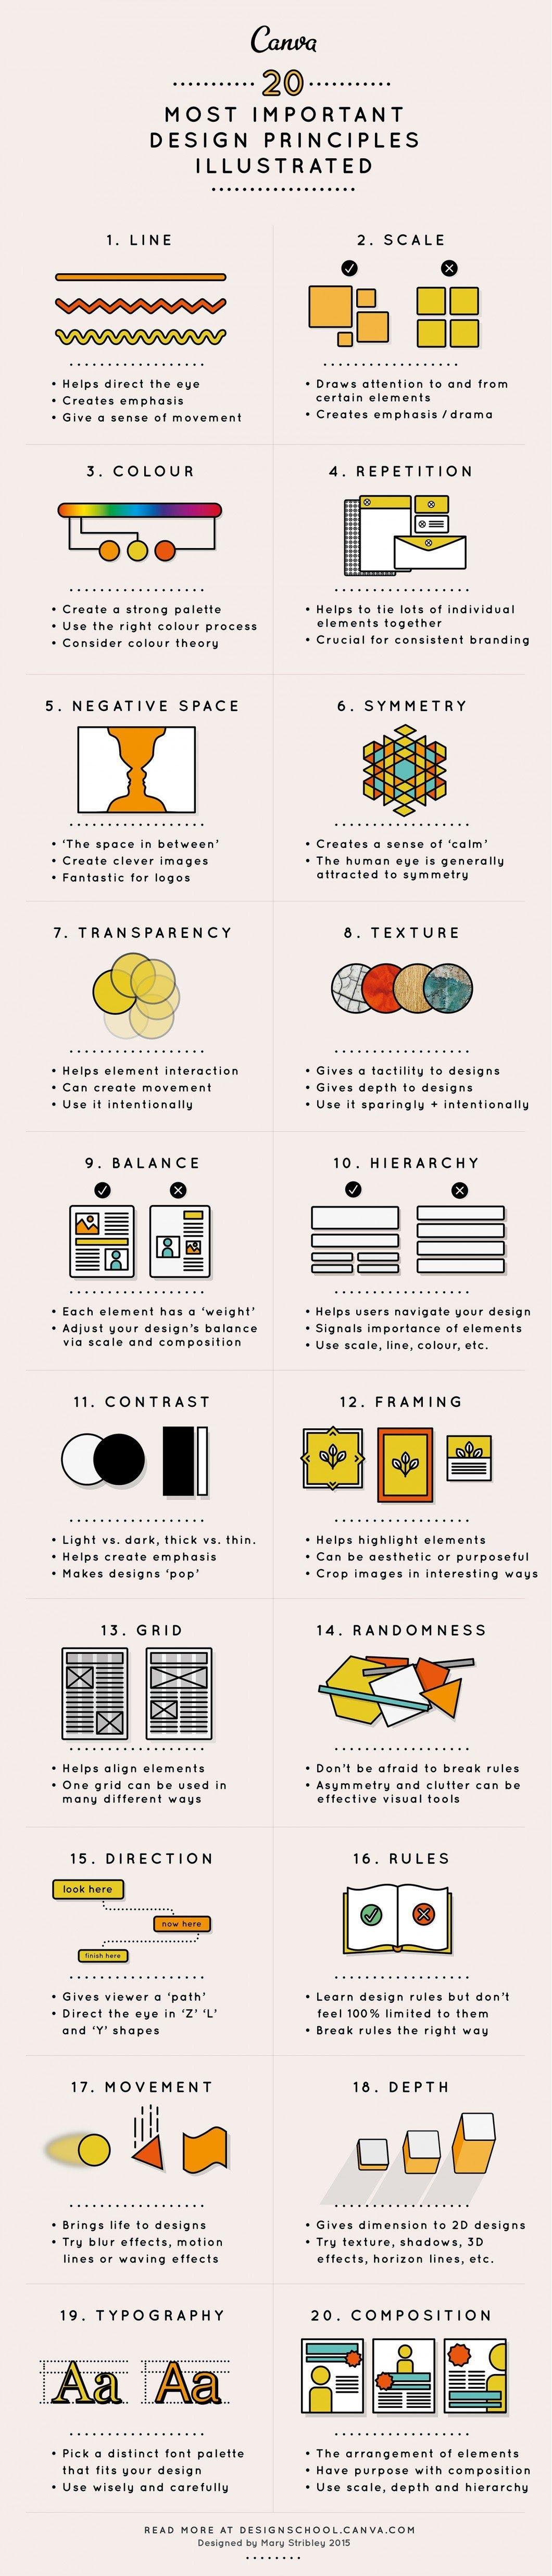 Design Elements & Principles - #infographic